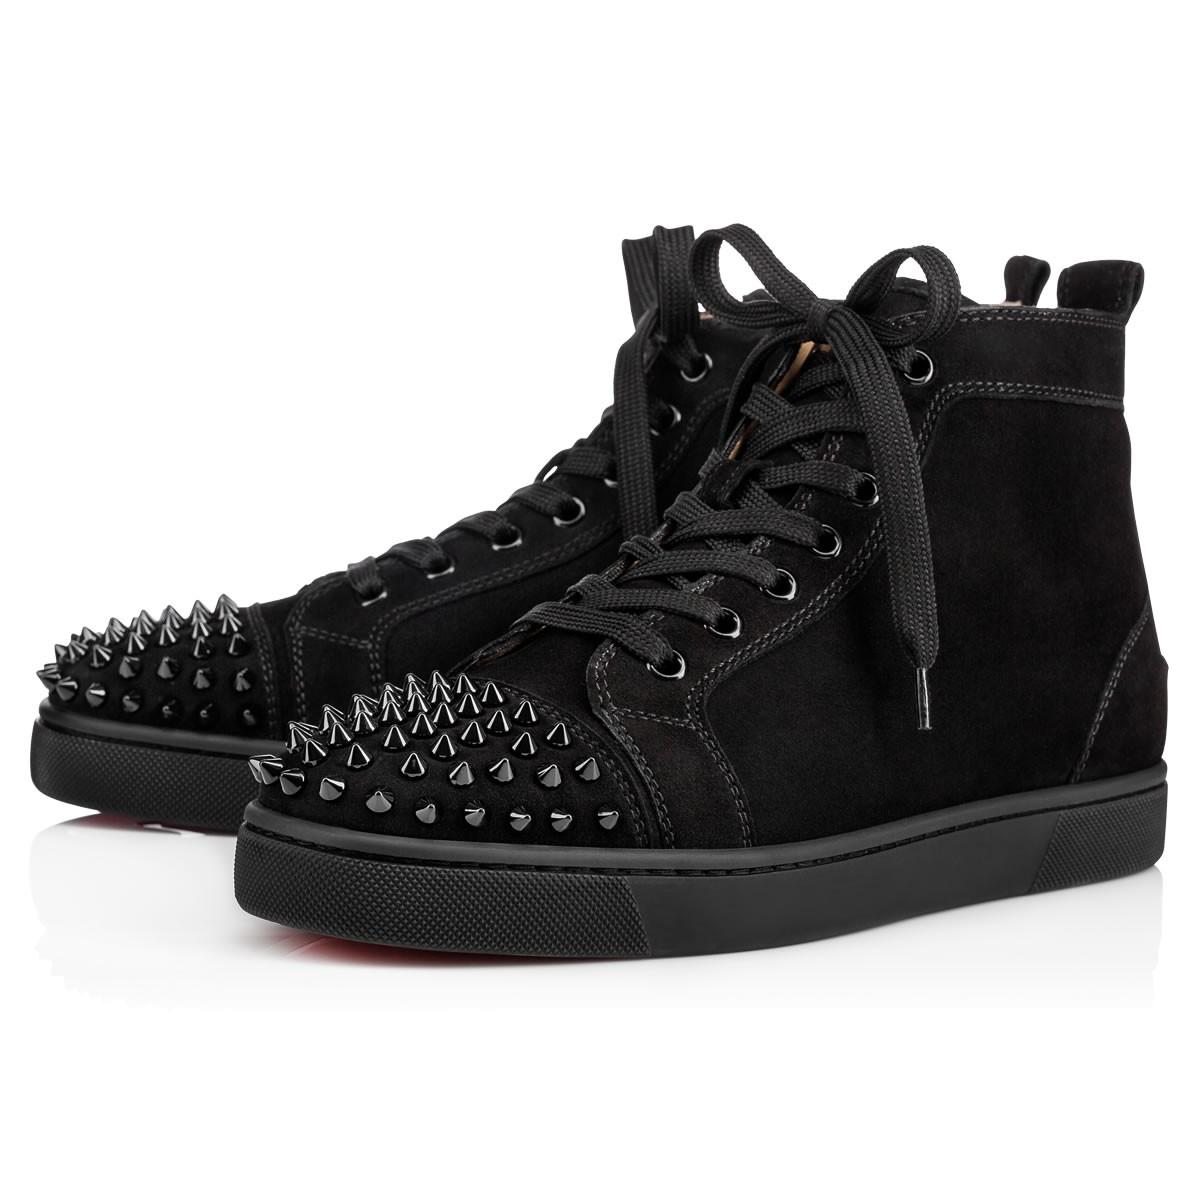 771e565d80a Crystal-Embellished High-Top Sneakers in Black/Black/Bk